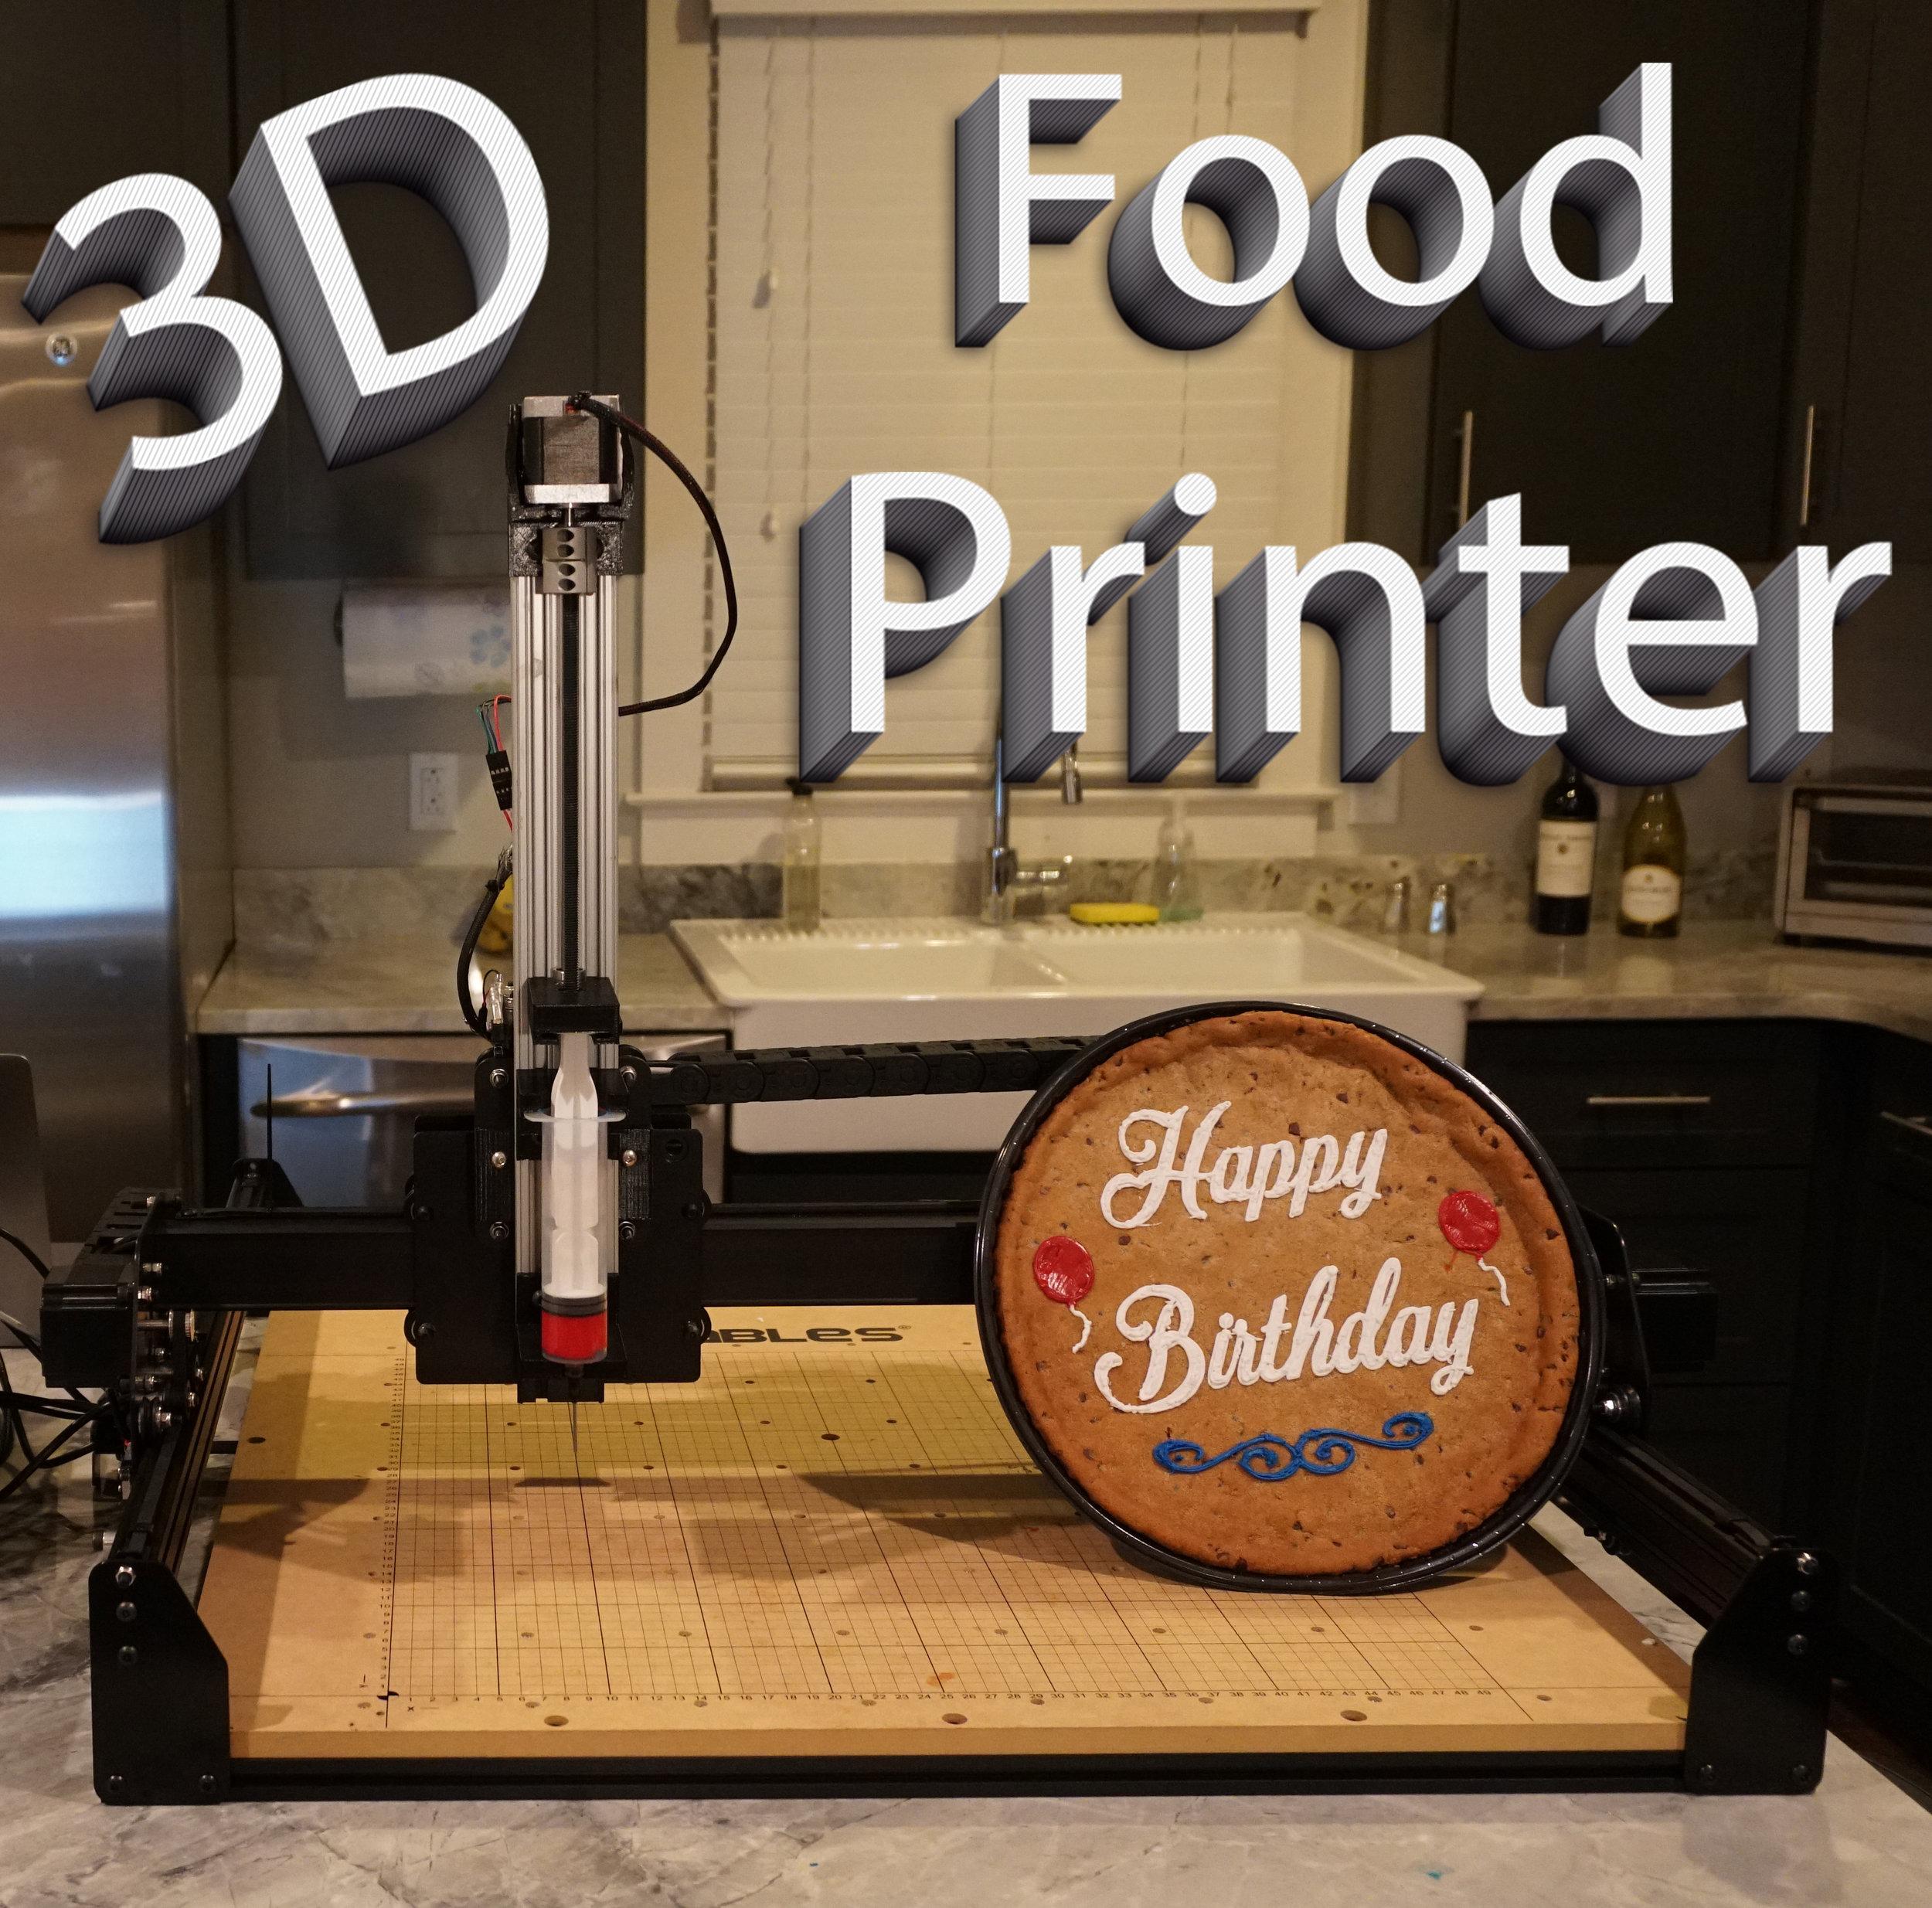 3D Food Printer.jpg